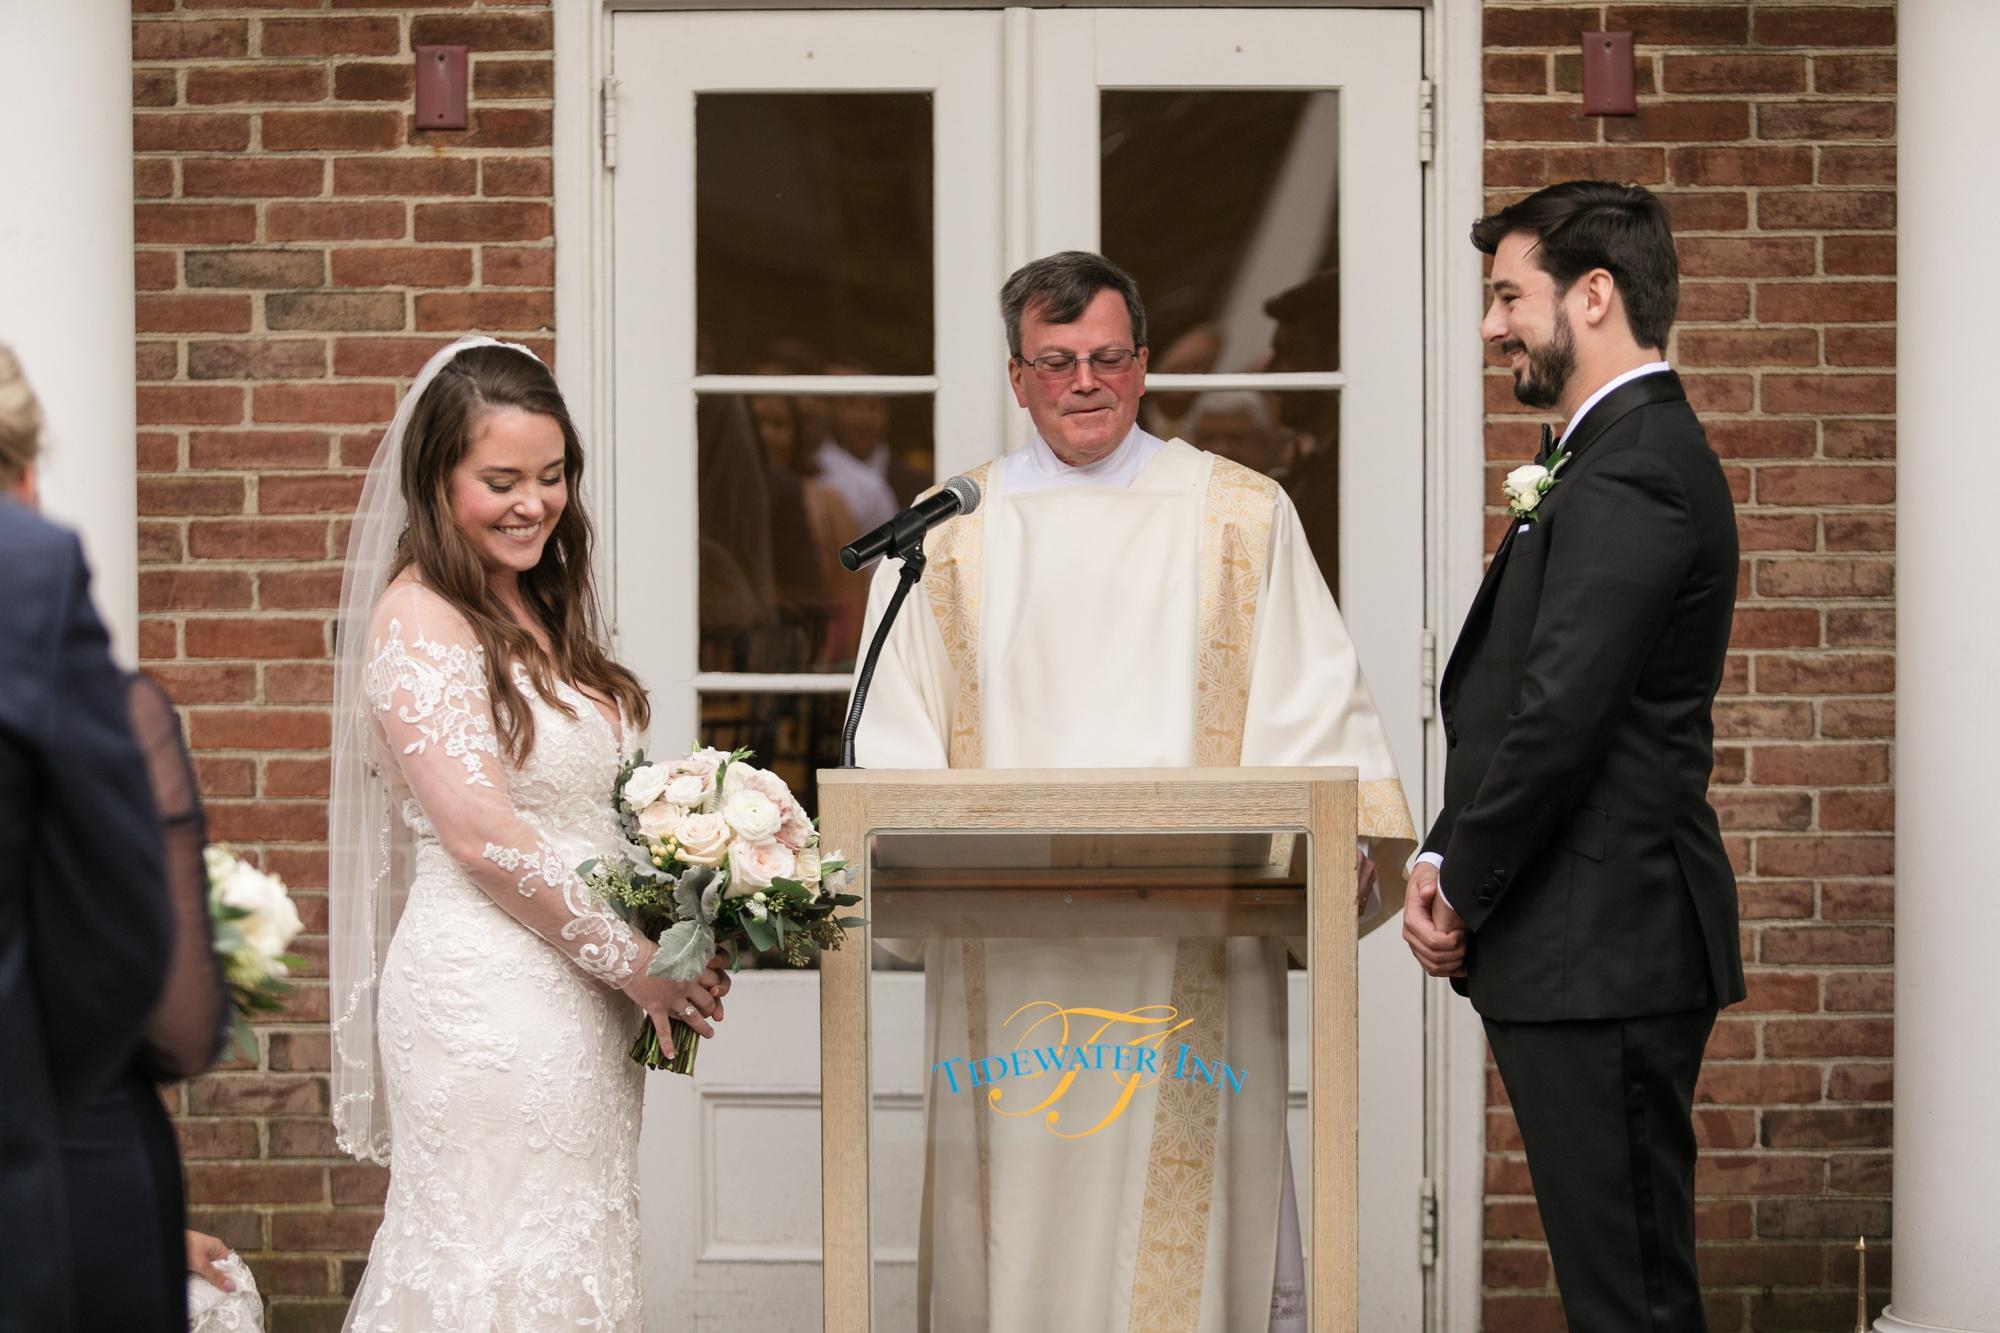 The Tidewater Inn Courtyard wedding ceremony